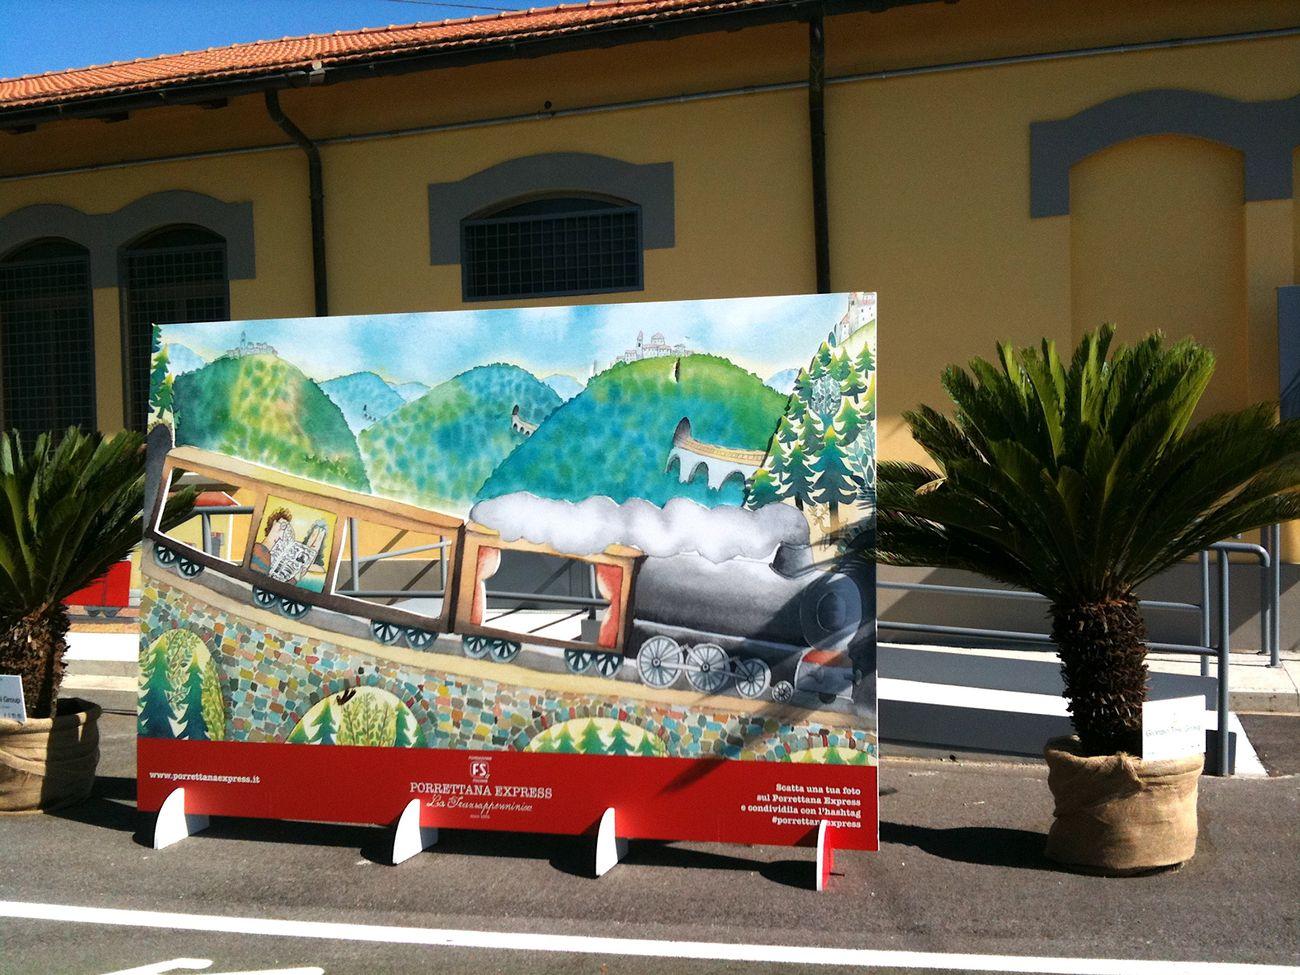 Porrettana Express. Photo Claudia Zanfi